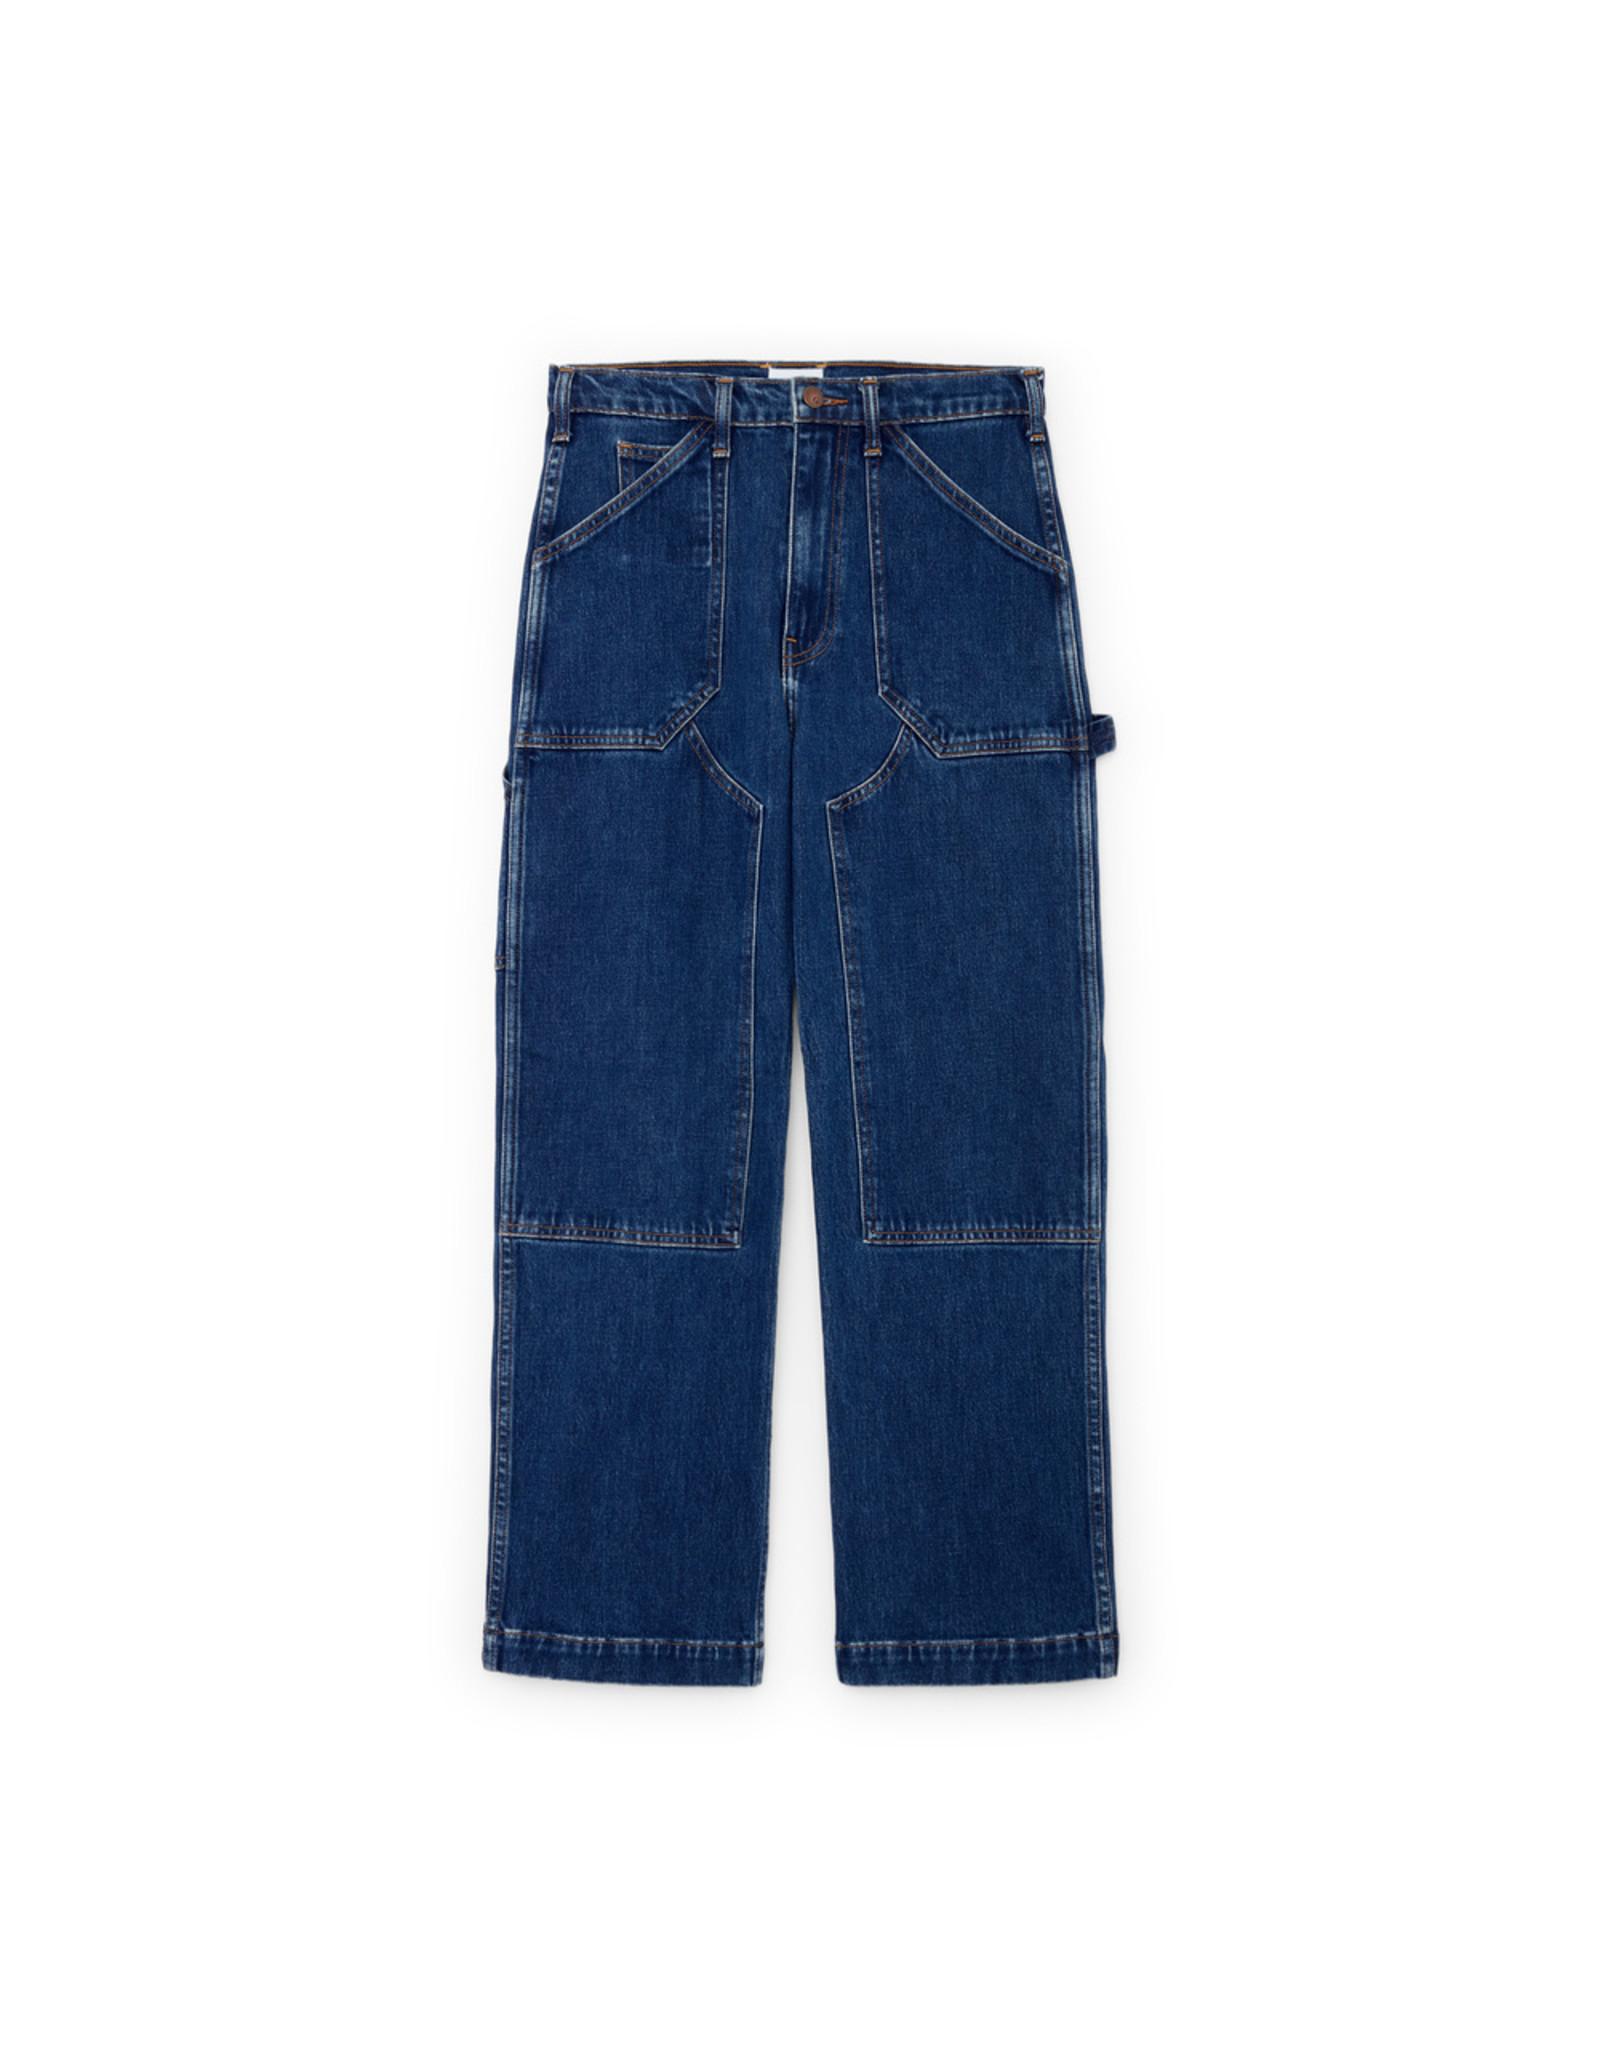 G. Label G. Label JP Workwear Jeans - Medium Blue Wash (Size: 29)